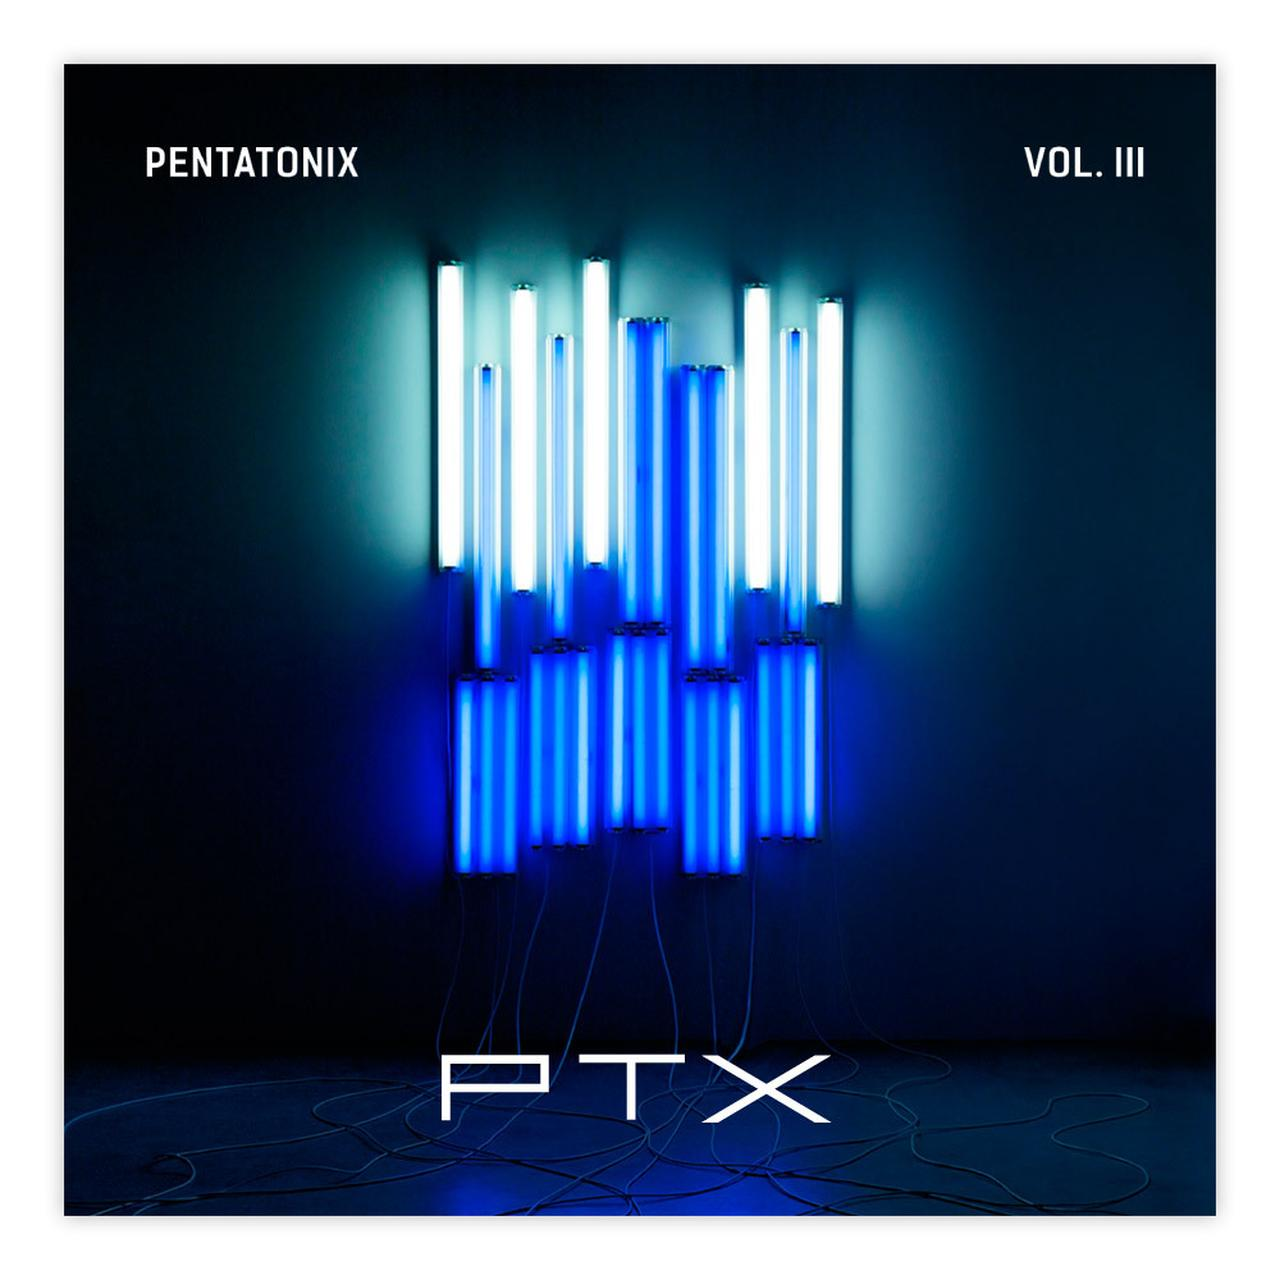 Pentatonix Vol. III CD